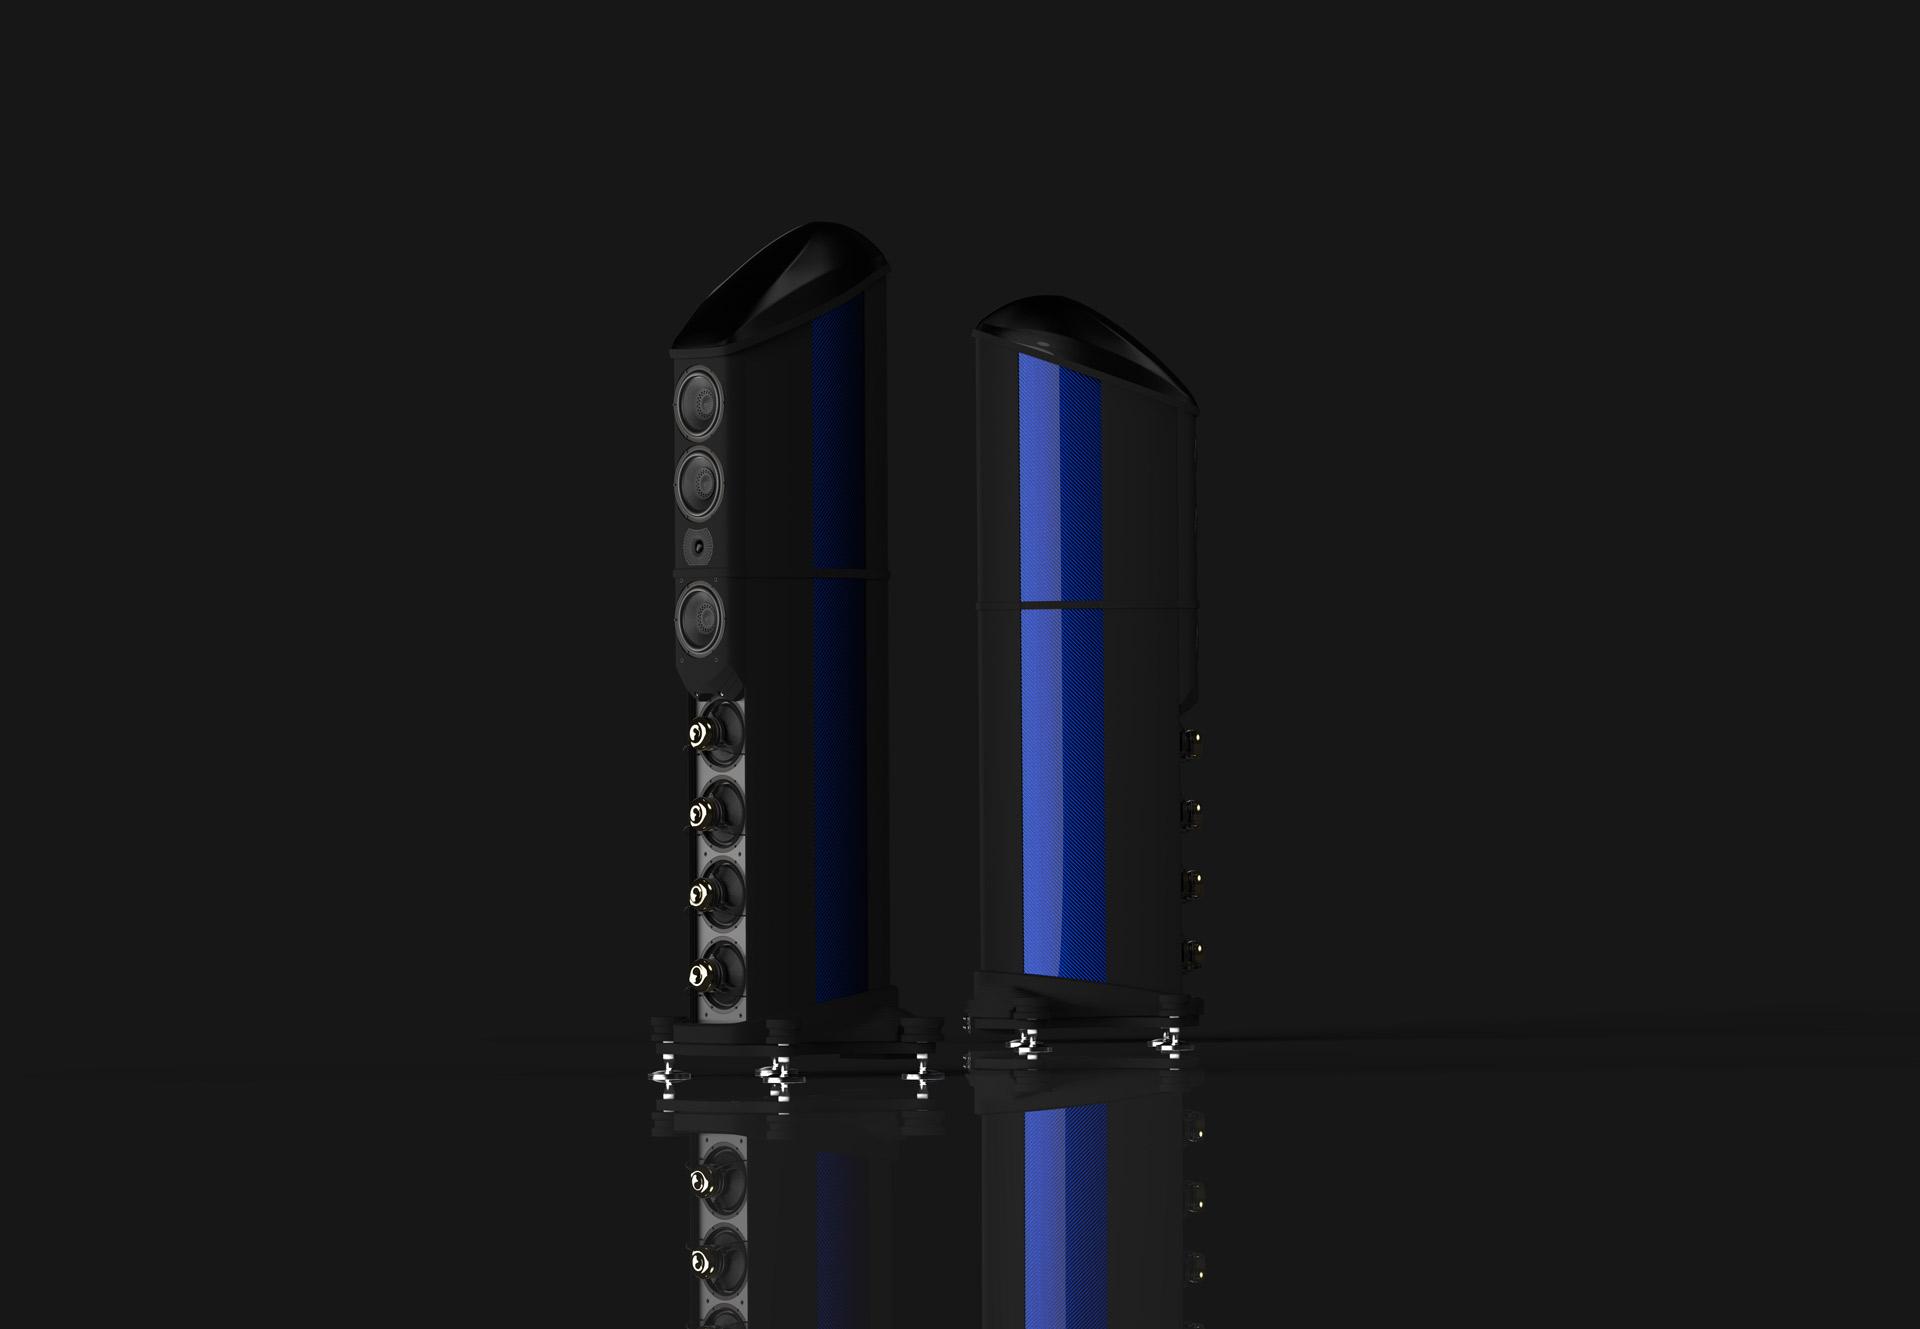 Wilson-Benesch-Geometry-Series-eminence-floorstanding-loudspeaker-singularity-audio-1